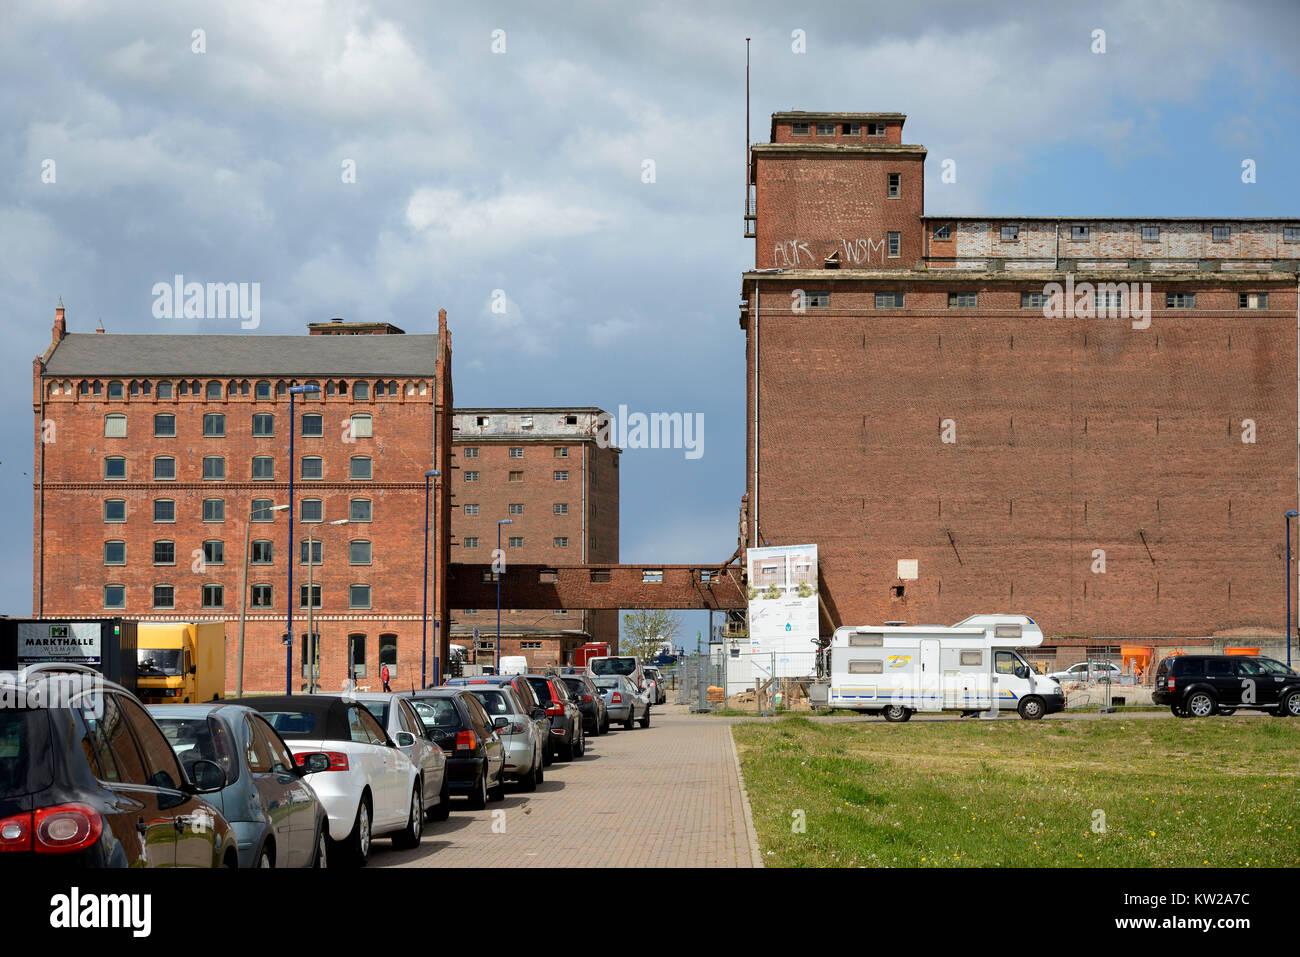 Wismar, historical memory buildings in the old harbour, historische Speichergebäude im Alten Hafen - Stock Image